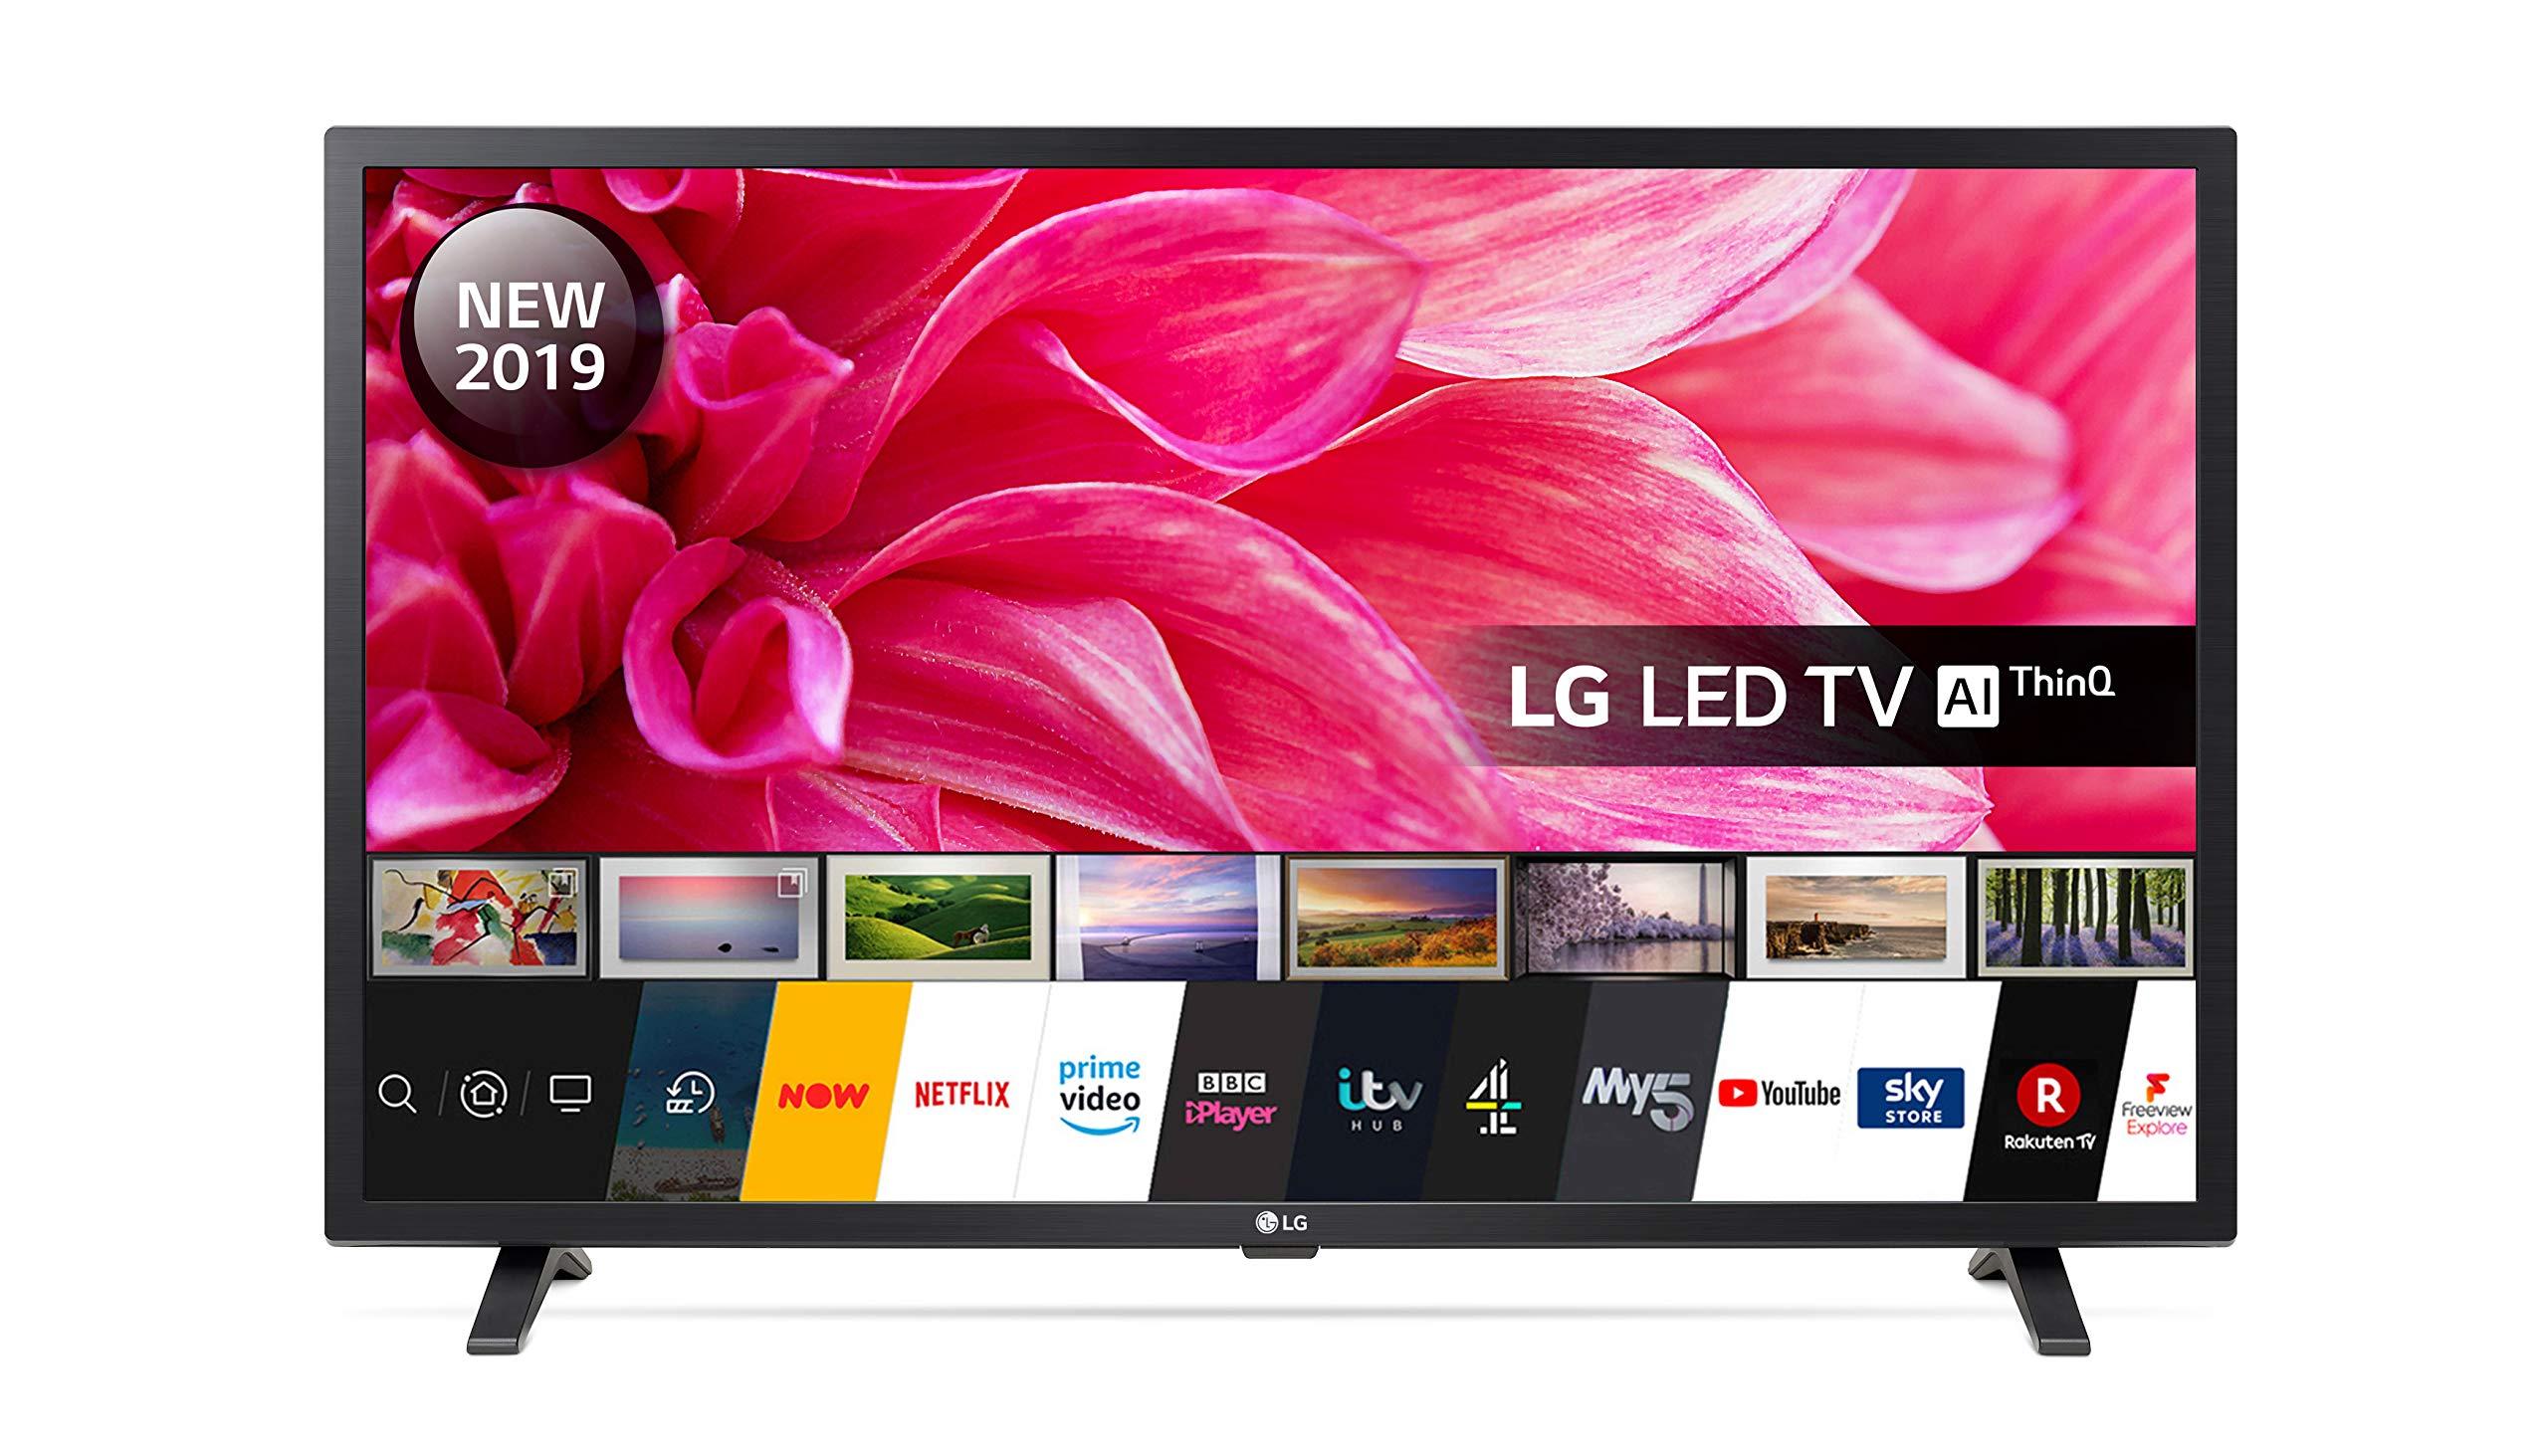 81XpNyoJi6L - LG Electronics 32LM630BPLA.AEK 32-Inch HD Ready Smart LED TV with Freeview Play - Ceramic Black Colour (2019 model)